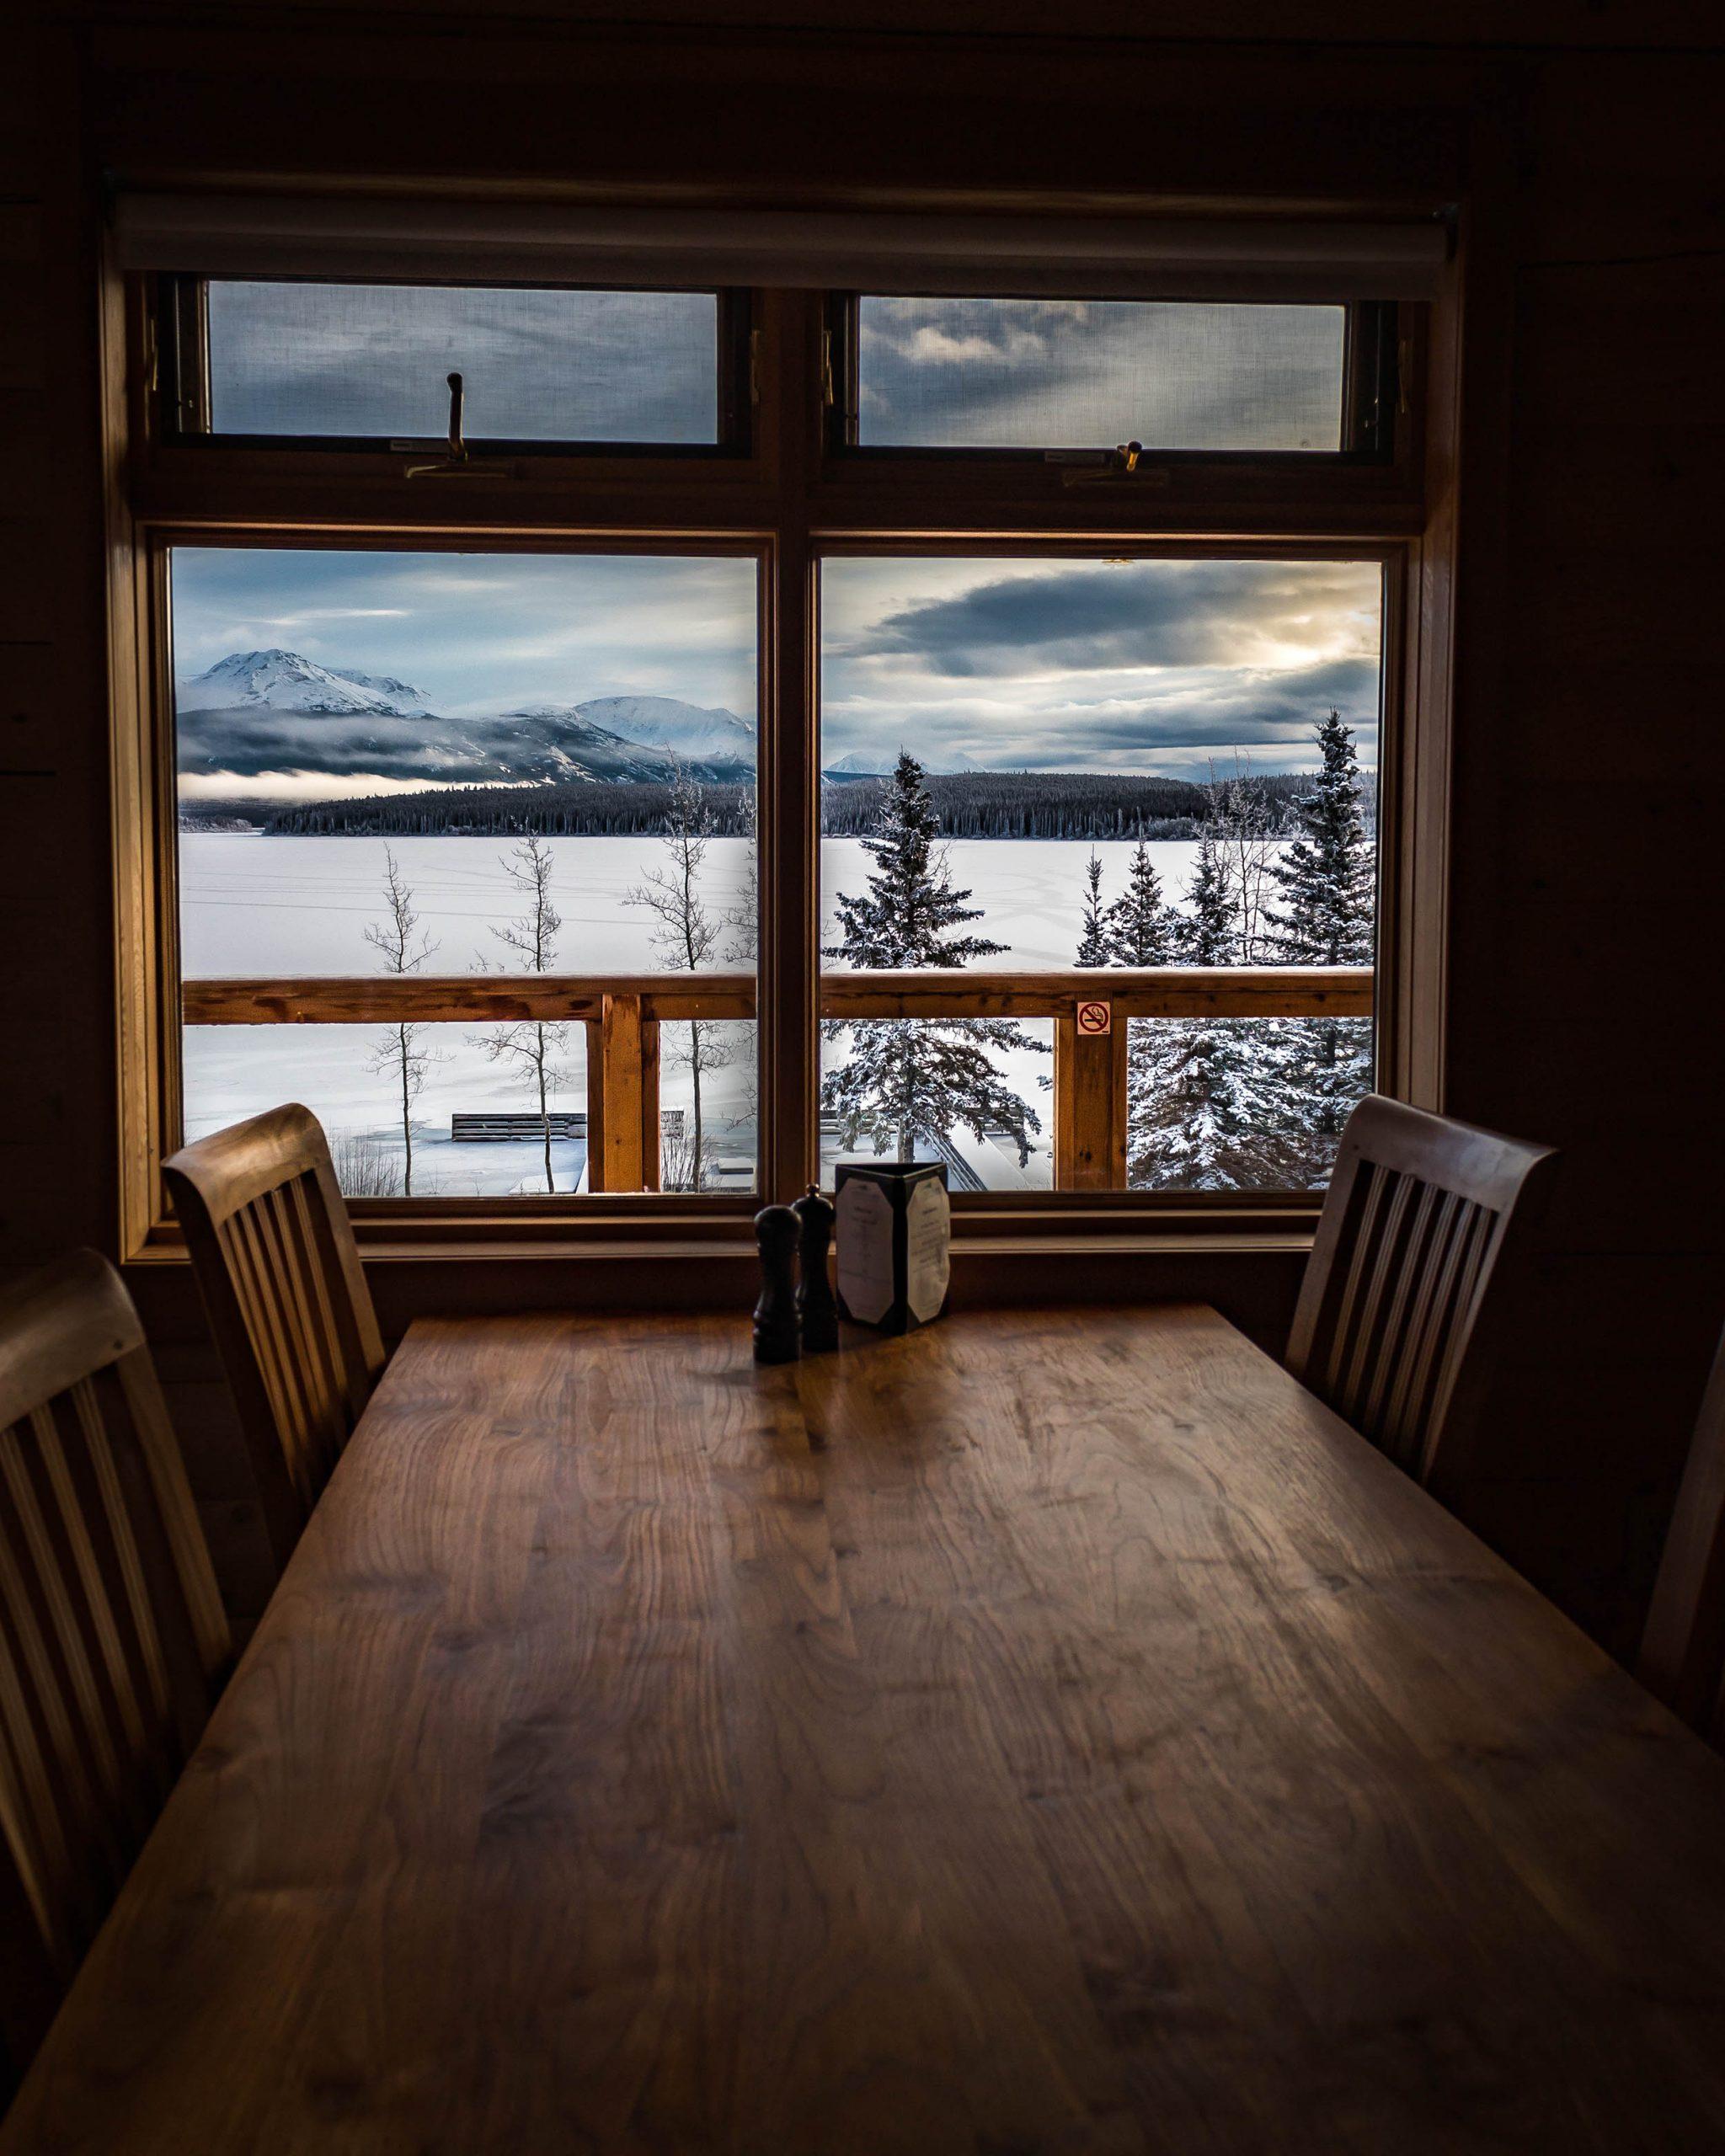 Vue d'un restaurant - Yukon - Marie Naudon